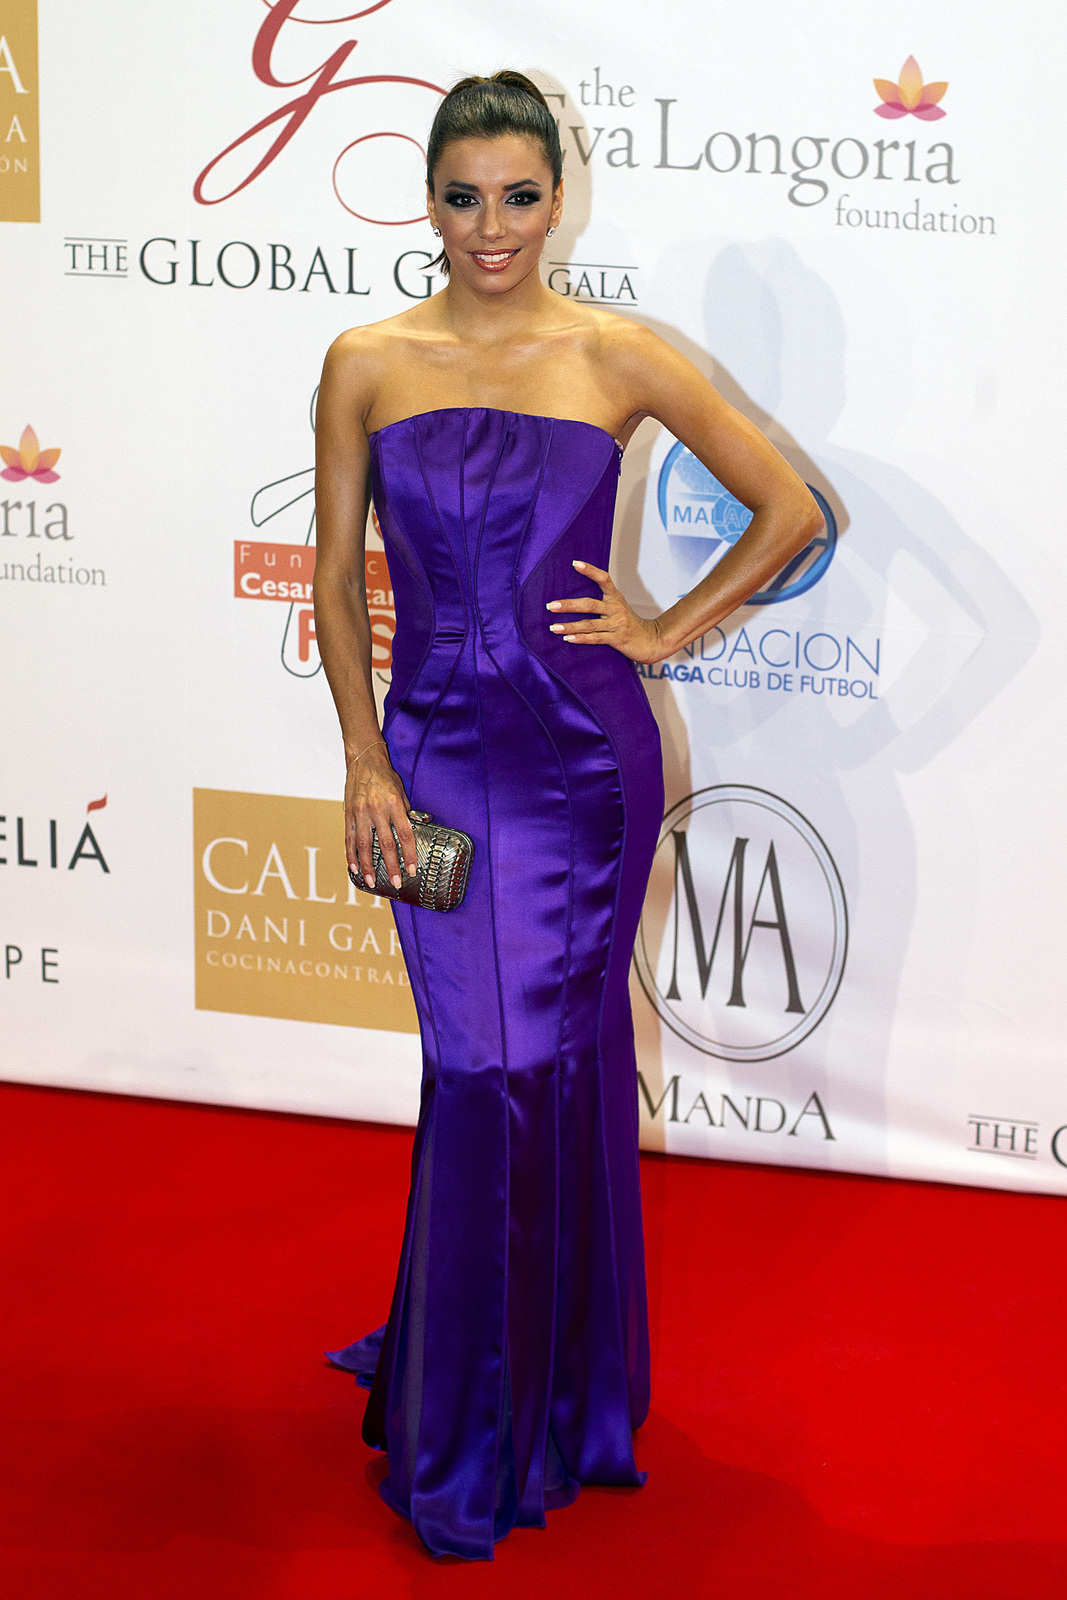 http://2.bp.blogspot.com/-212yEZJx57I/UDhOgRKQXSI/AAAAAAAAbXo/O5oLAI1cW74/s1600/Eva+Longoria+at+The+Global+Gift+Gala+2012+in+Marbella+%281%29.jpg